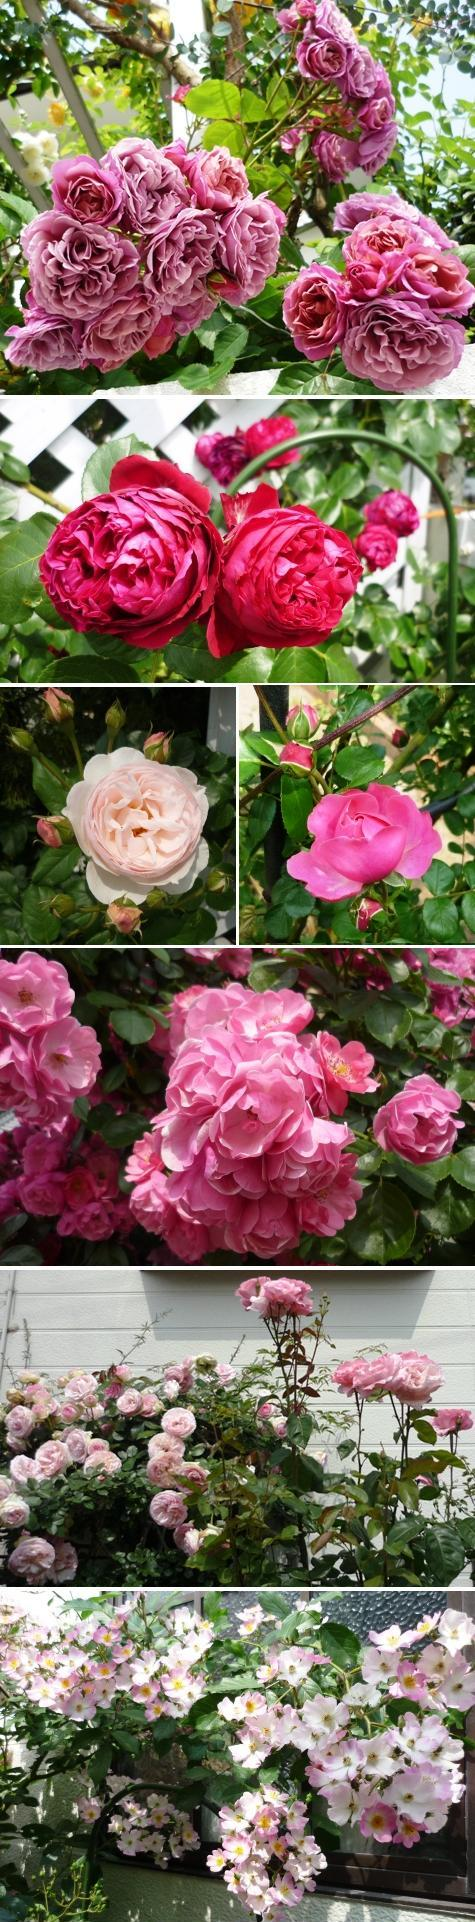 a薔薇2P1230850